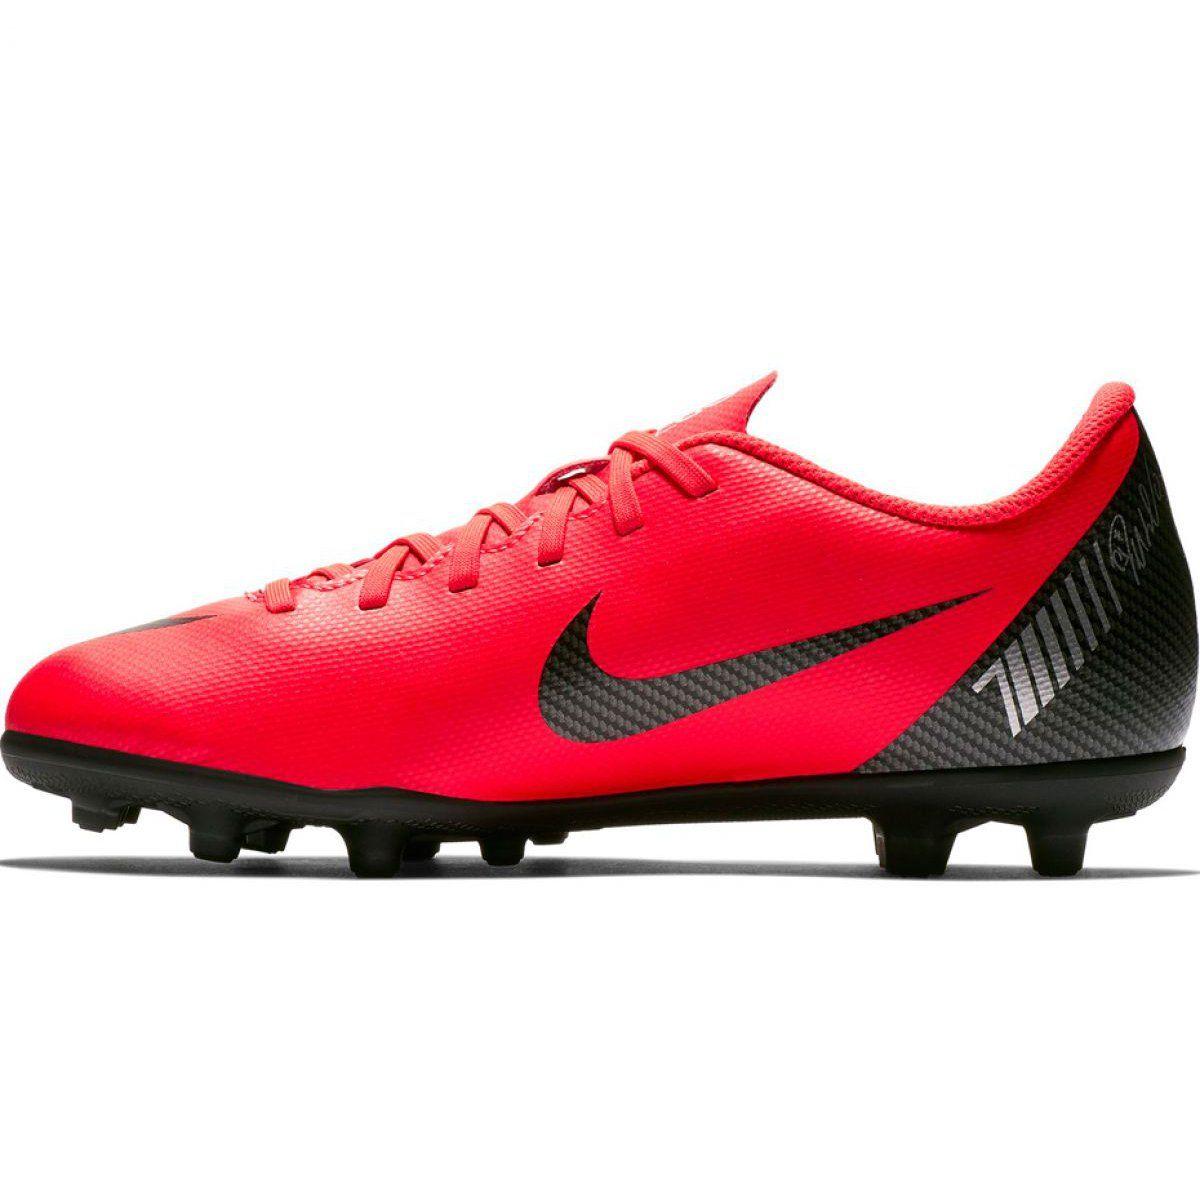 Buty Pilkarskie Nike Mercurial Vapor 12 Club Gs Cr7 Fg Mg Jr Aj3095 600 Czerwone Wielokolorowe Football Shoes Mens Football Cleats Shoes